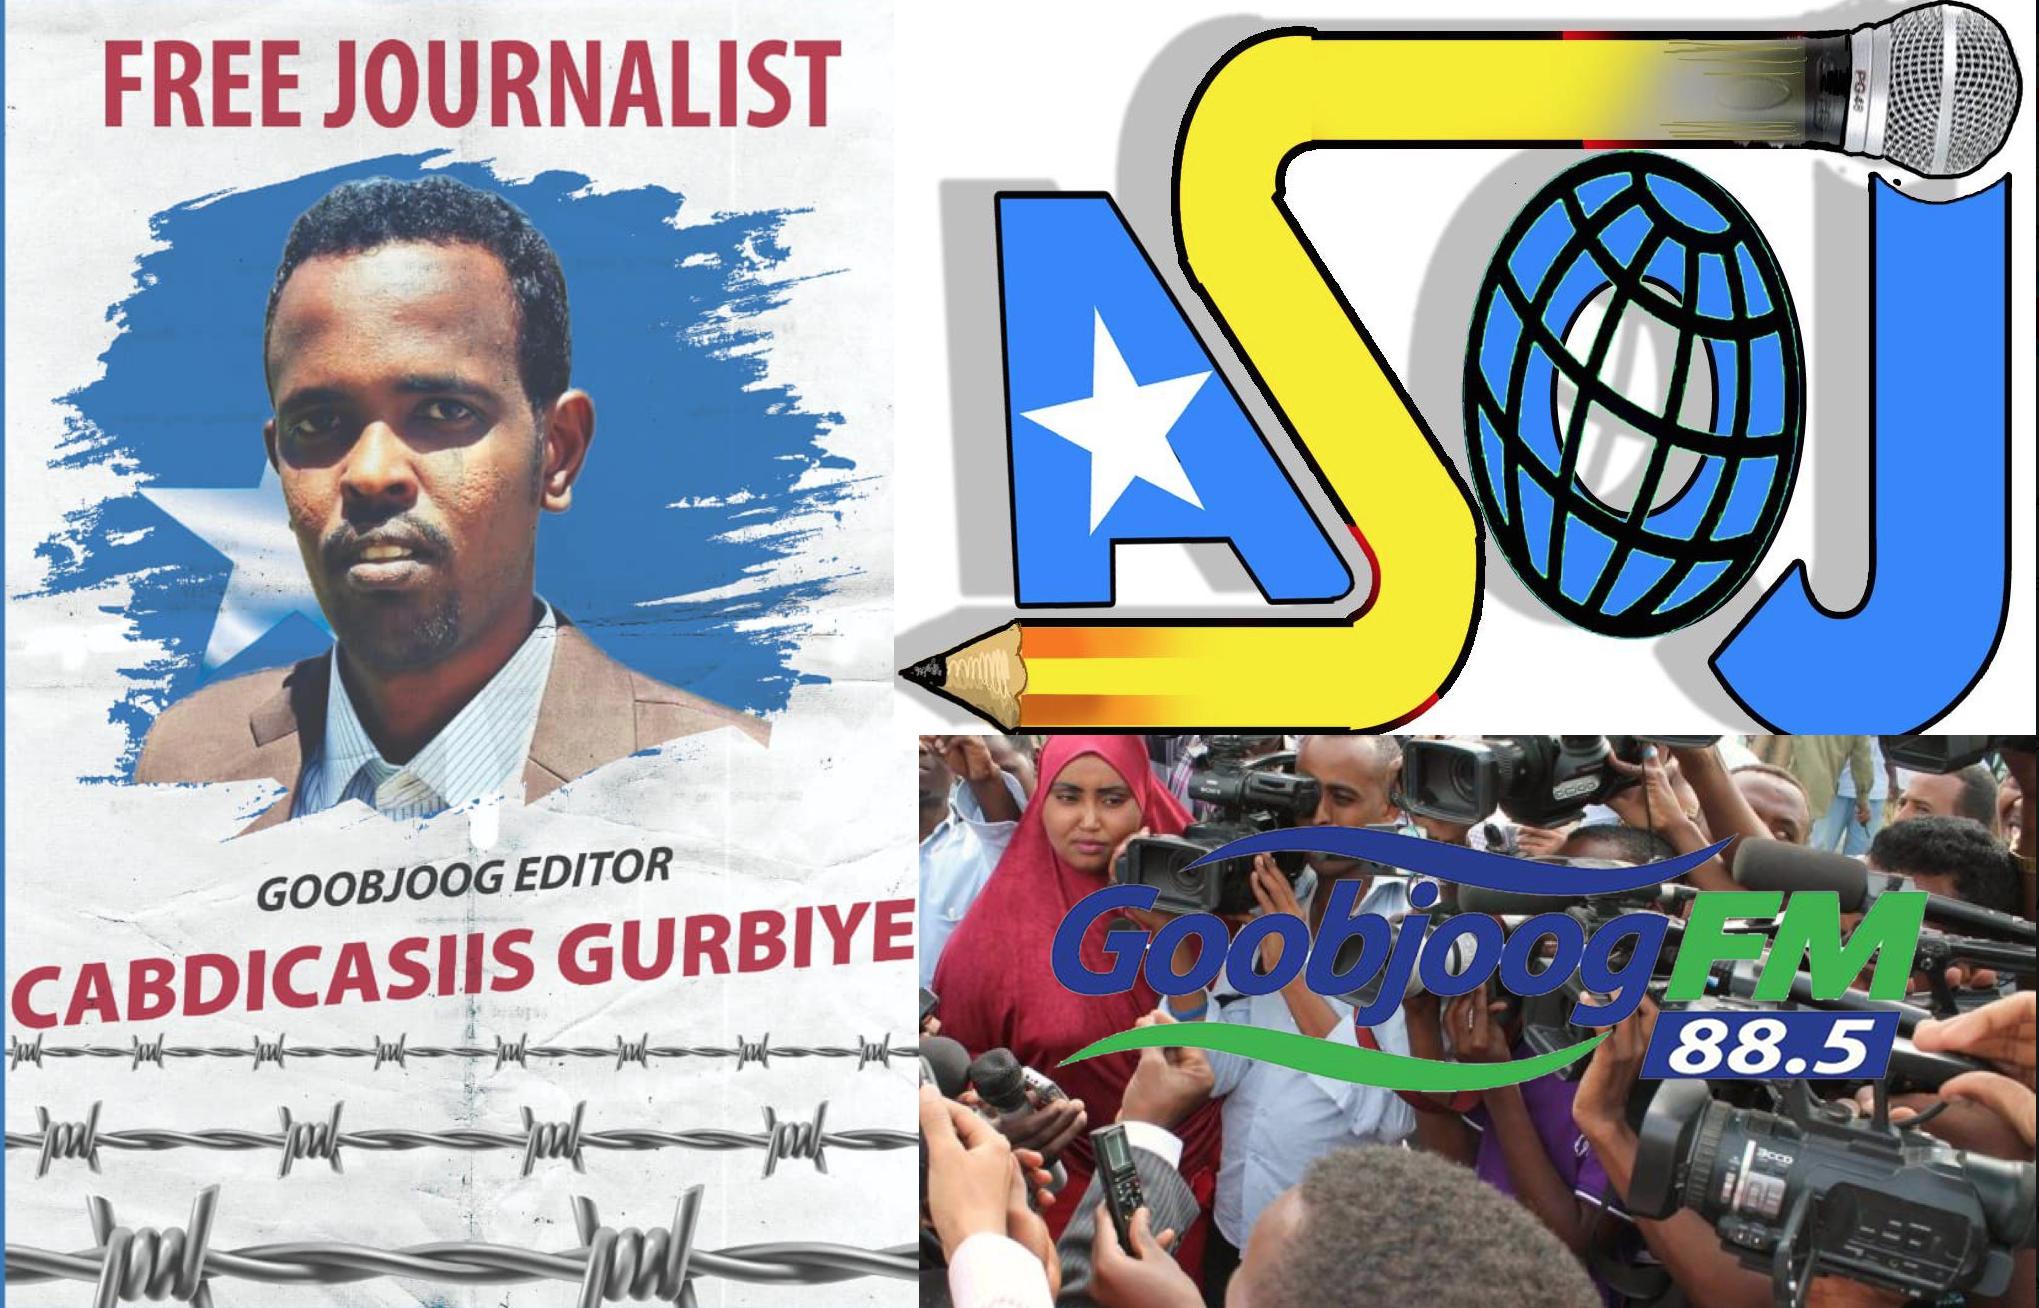 ASOJ condemns journalist jailed in Mogadishu over social media posts